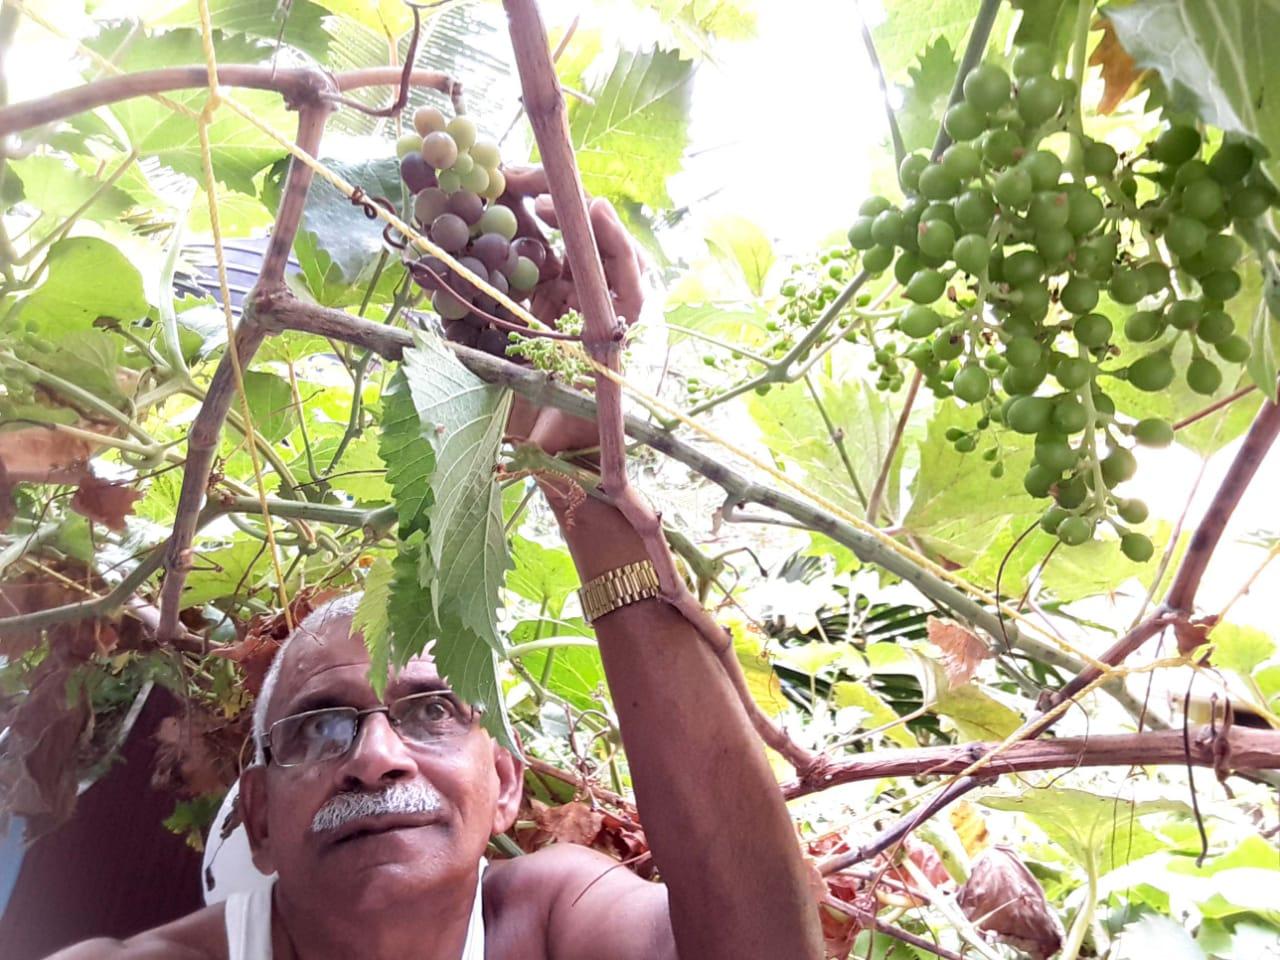 Abu Haji has grown organic grapes in his home